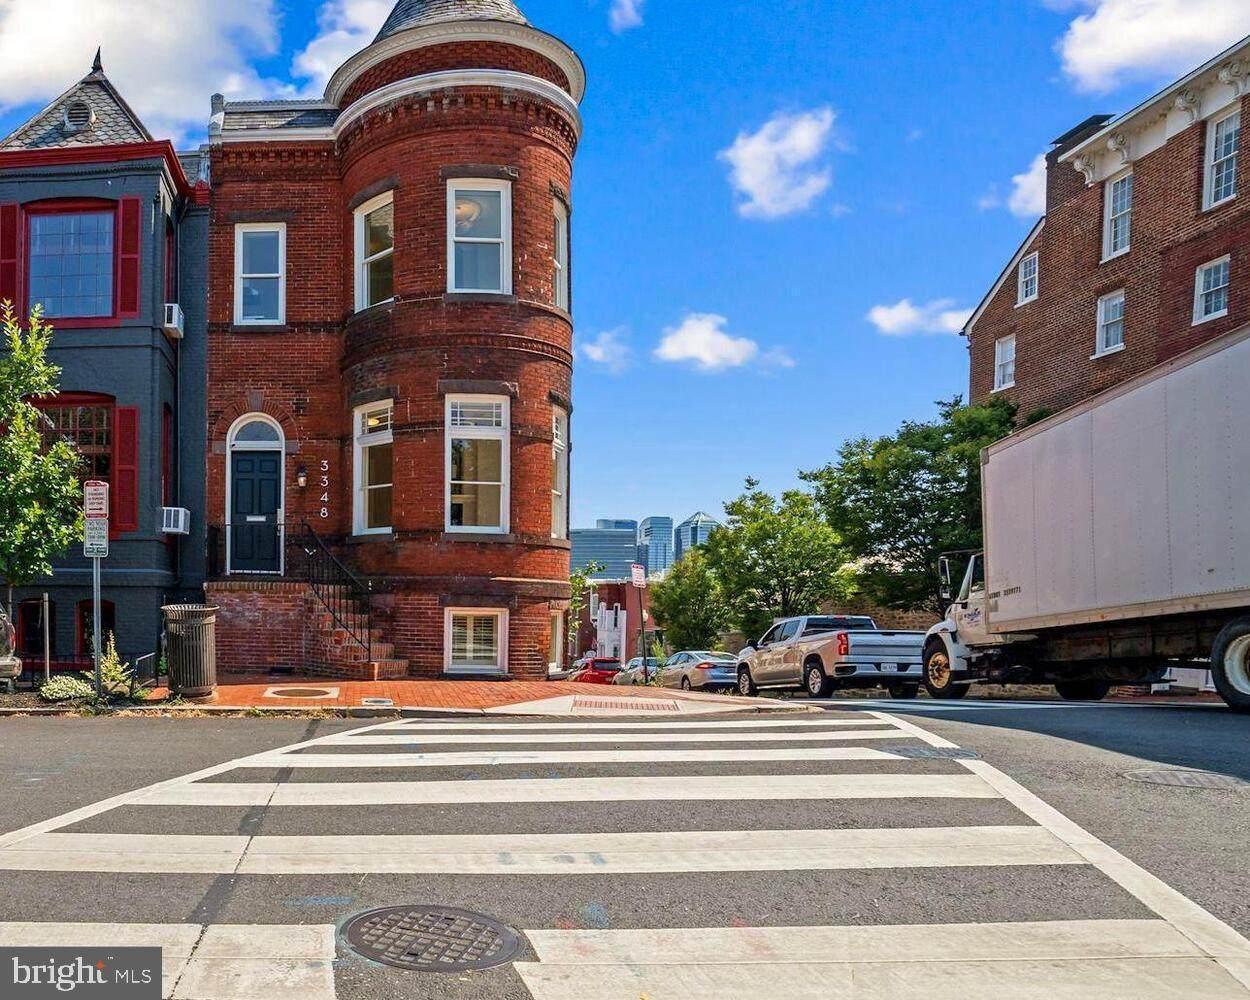 3348 Prospect Street - Photo 1